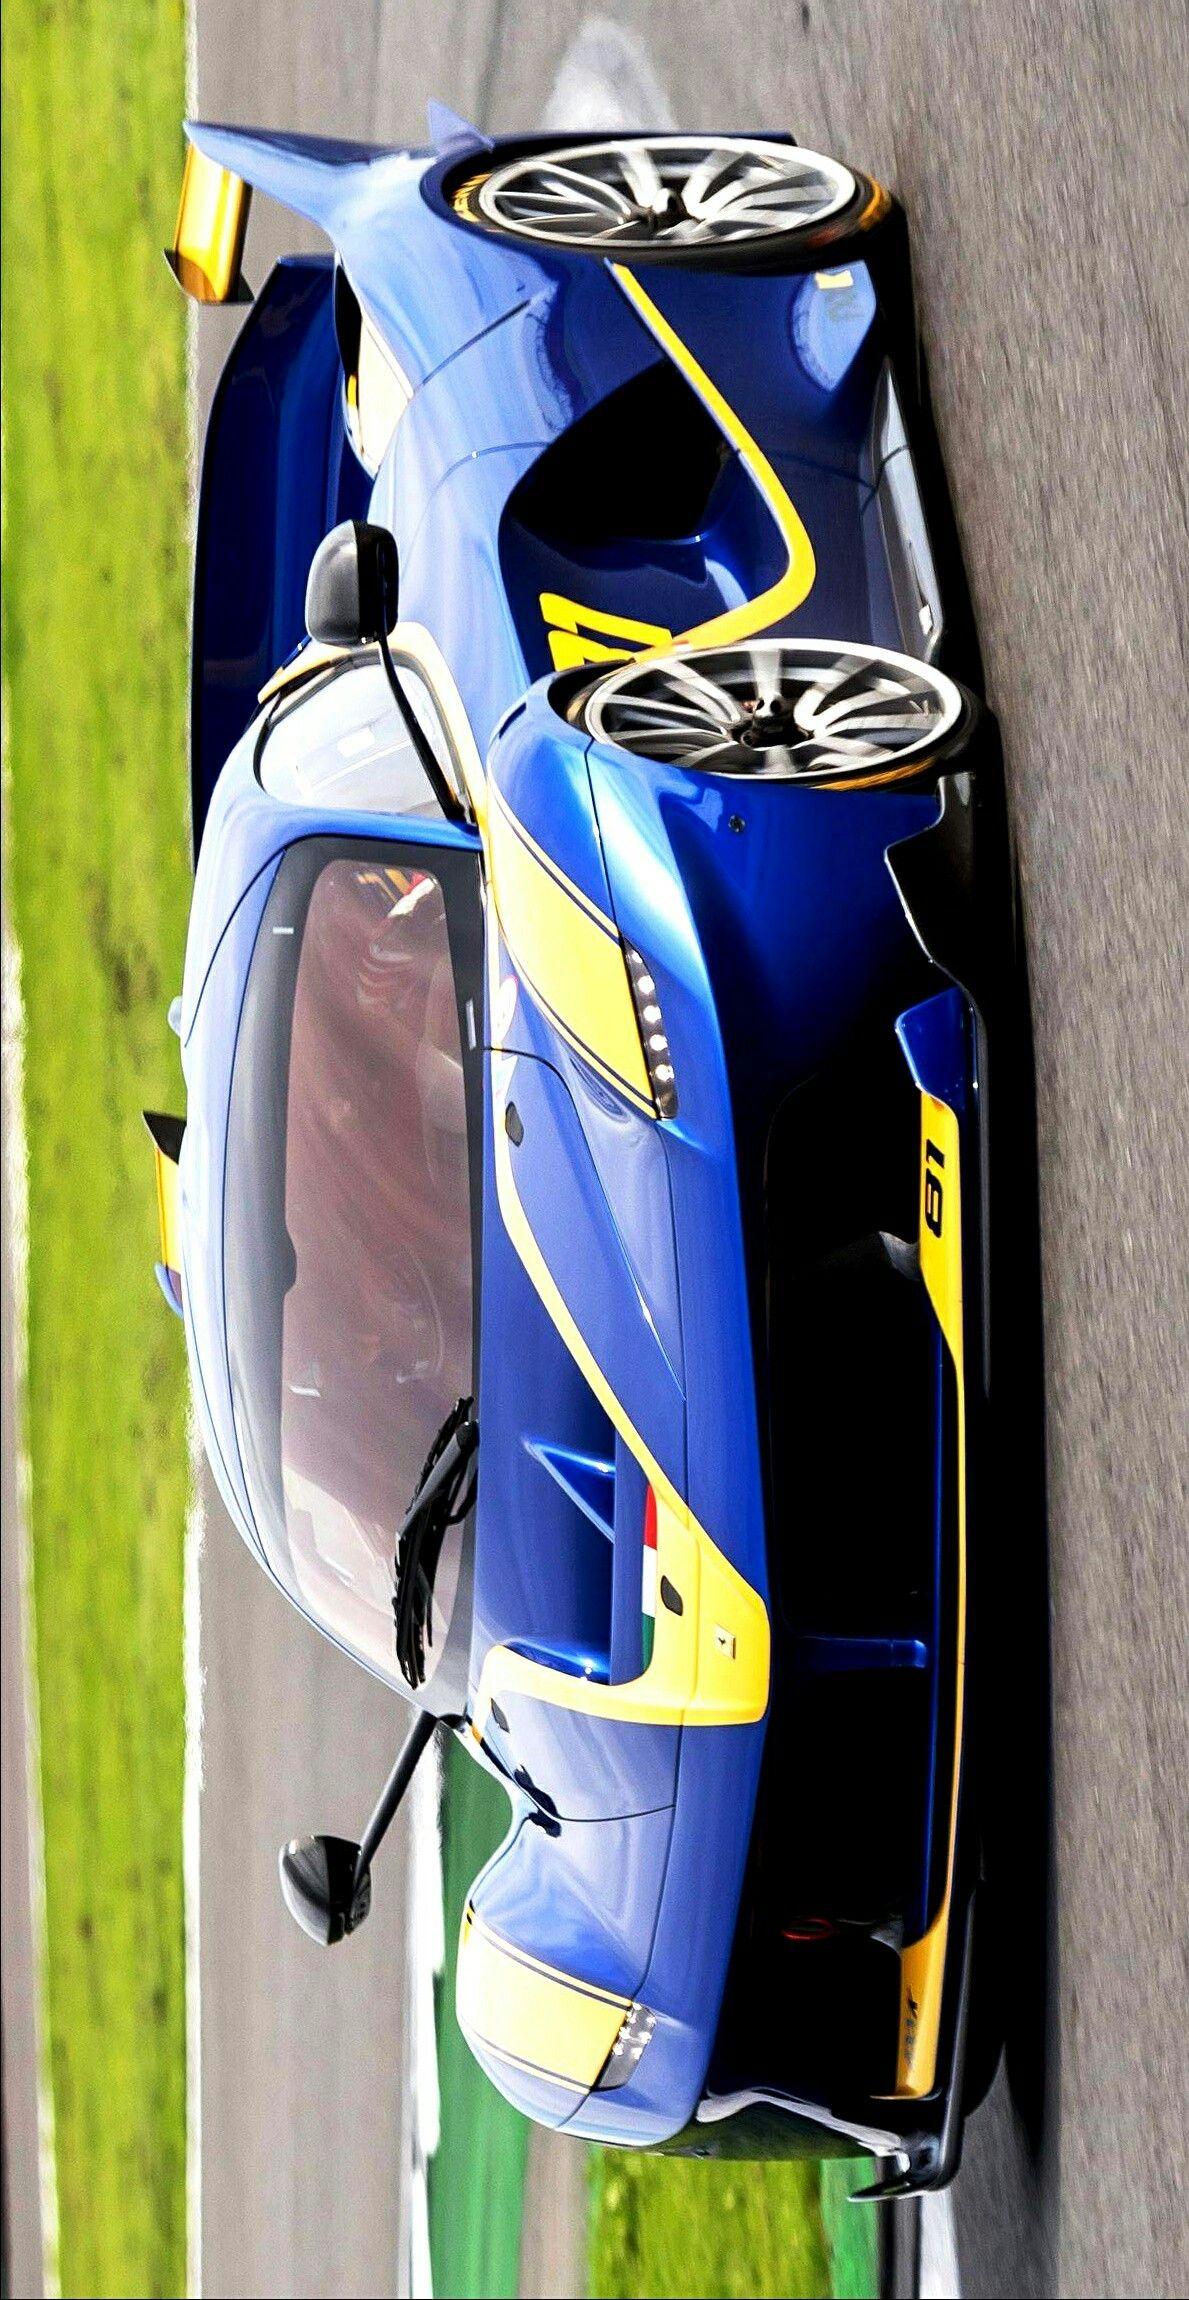 (°!°) Ferrari FXX-K at Silverstone #ferrarifxx